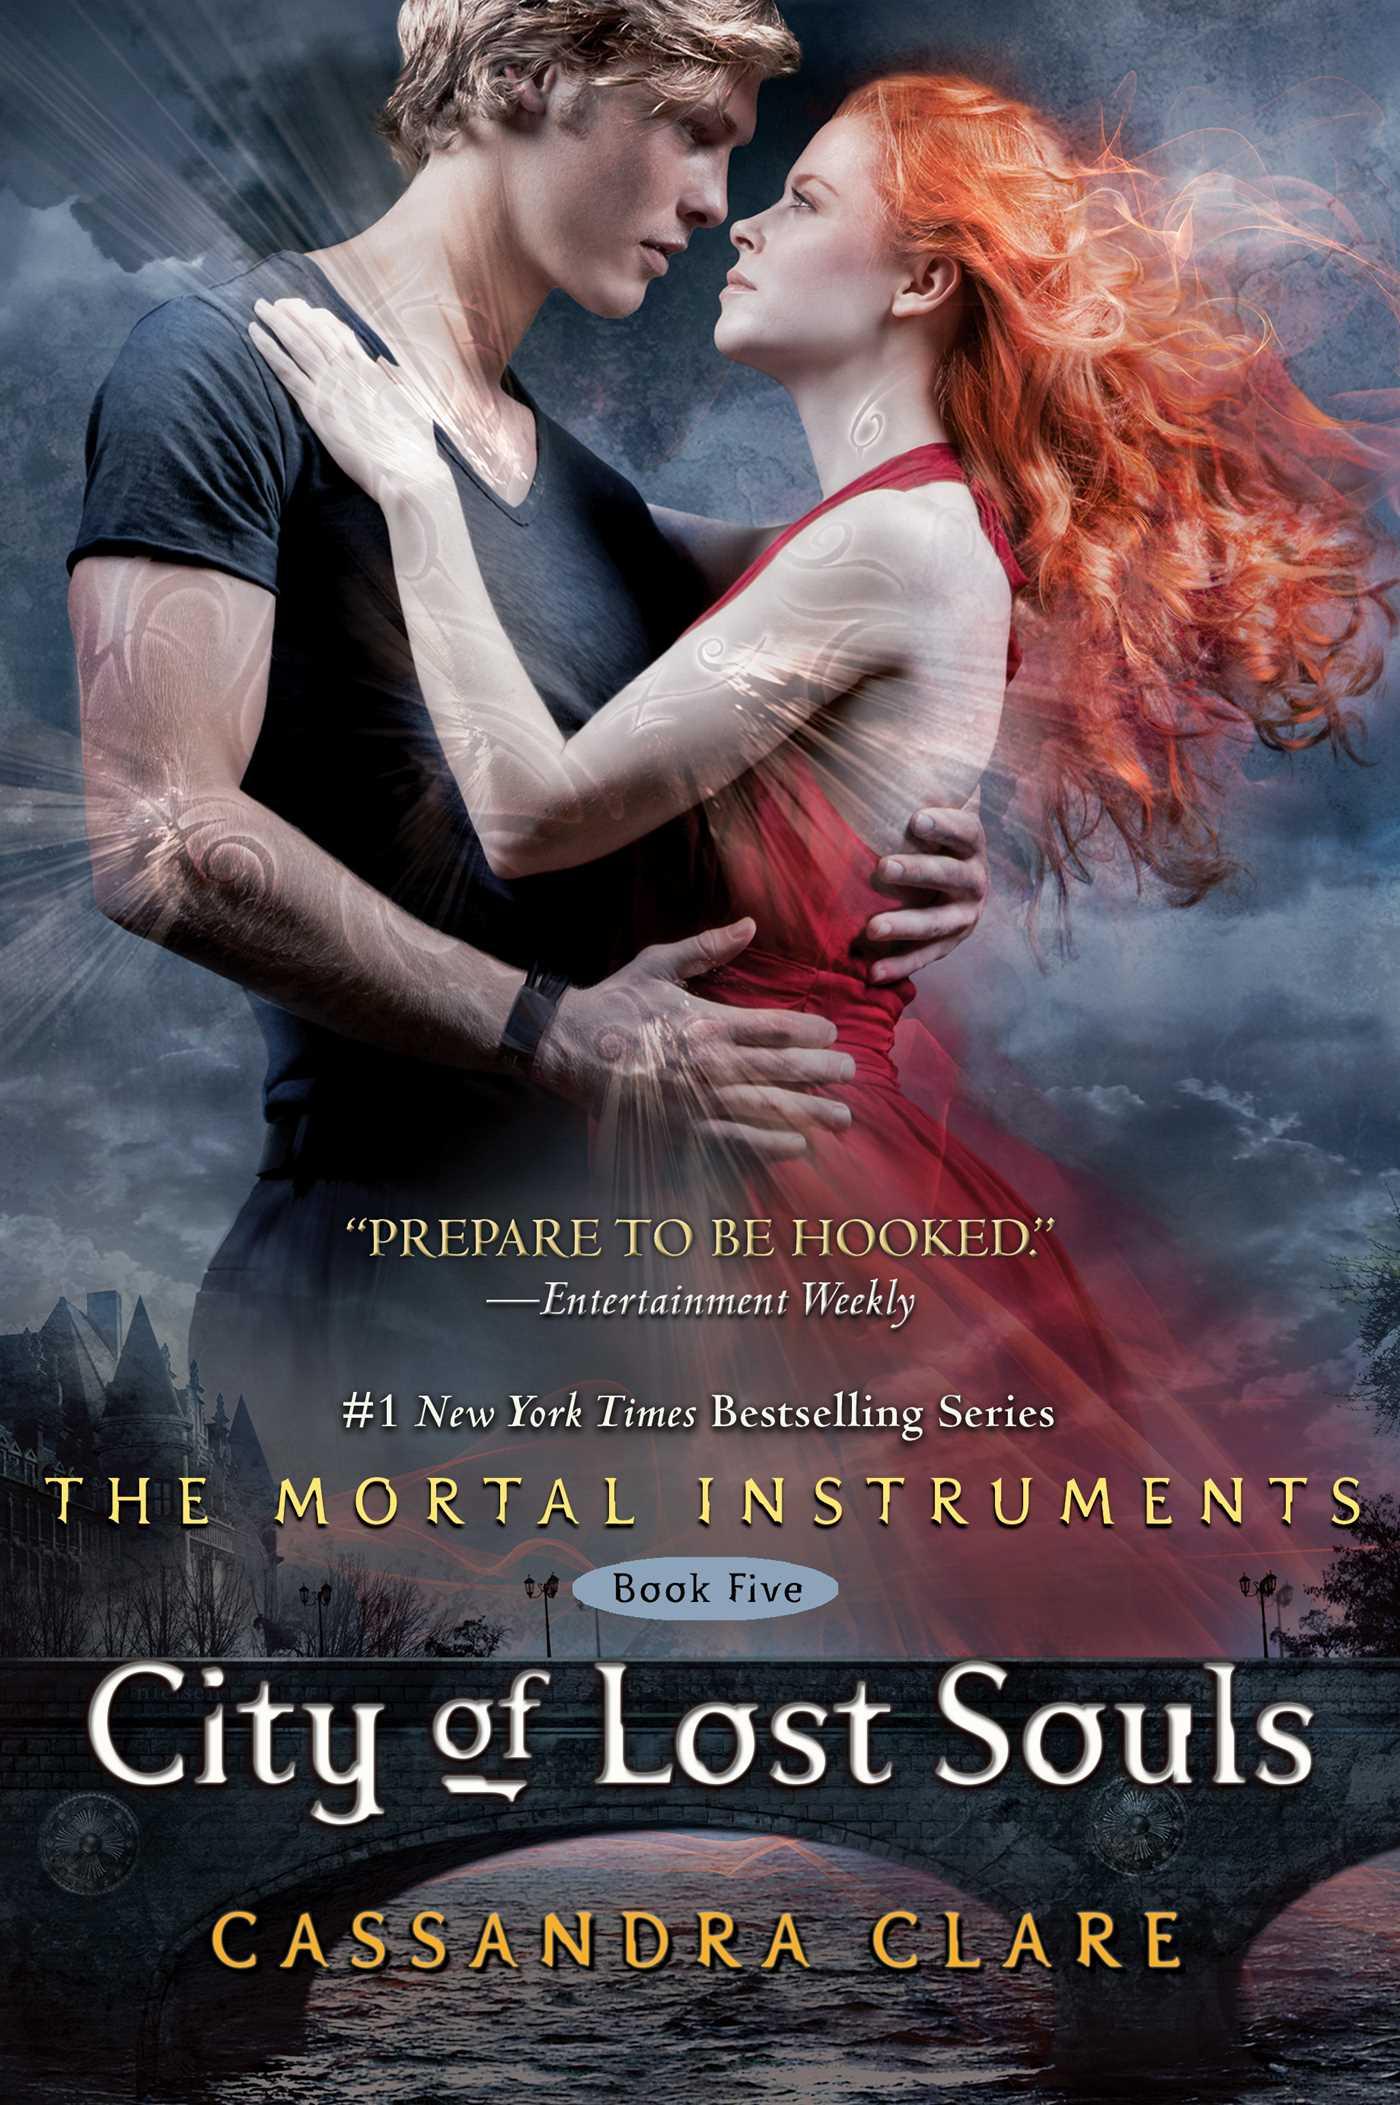 City of lost souls 9781442416864 hr